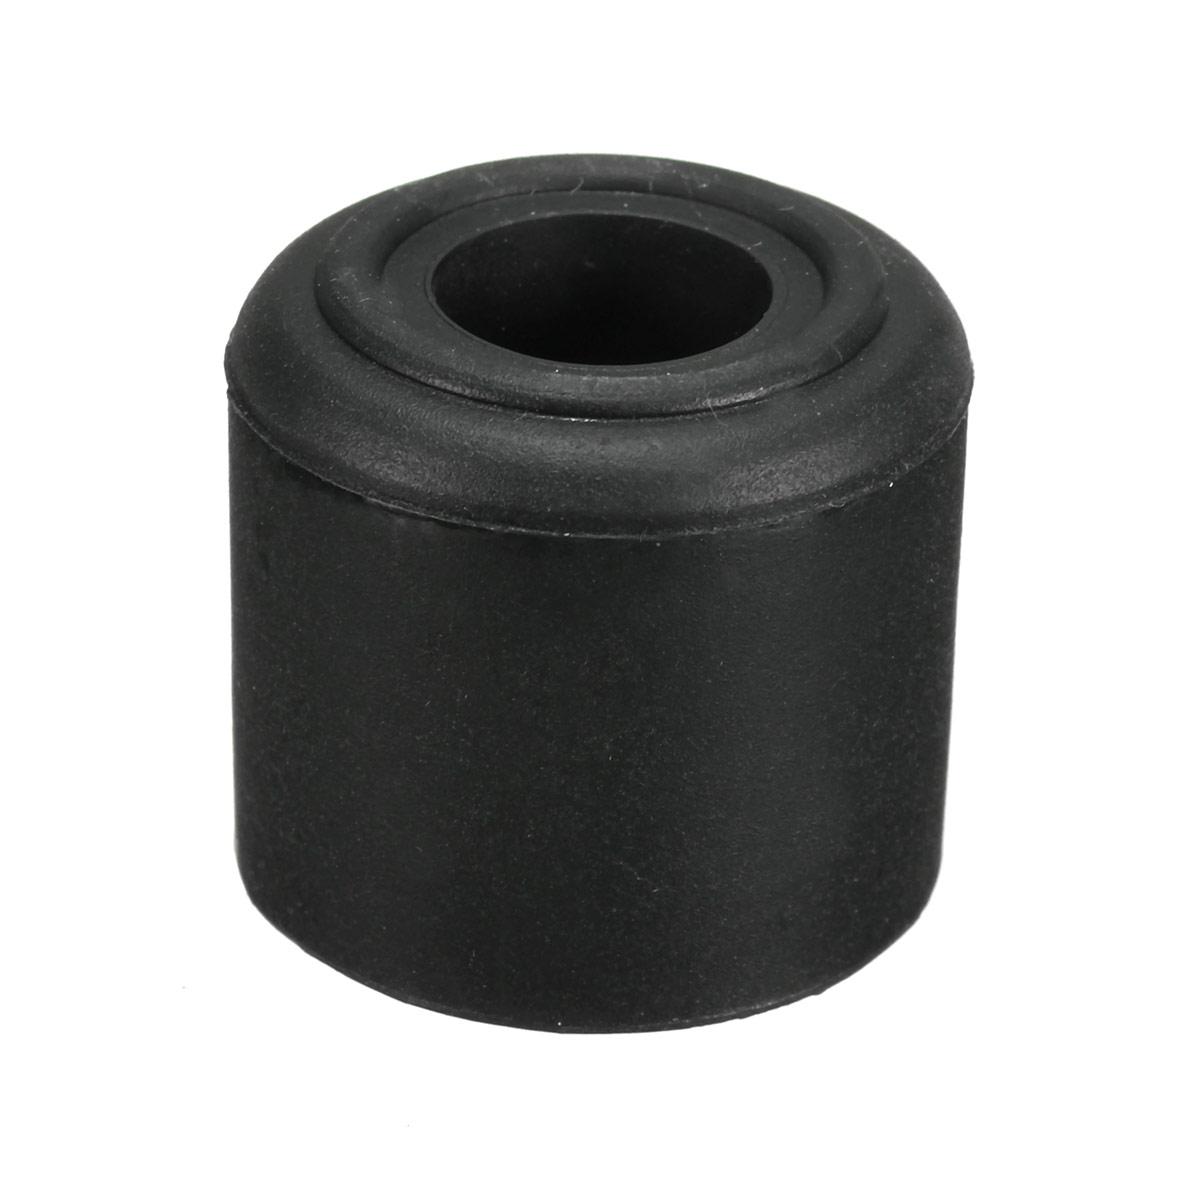 t rstopper gummipuffer vollgummi anschraubfu gummi 28mm x 25mm schwarz wei ebay. Black Bedroom Furniture Sets. Home Design Ideas